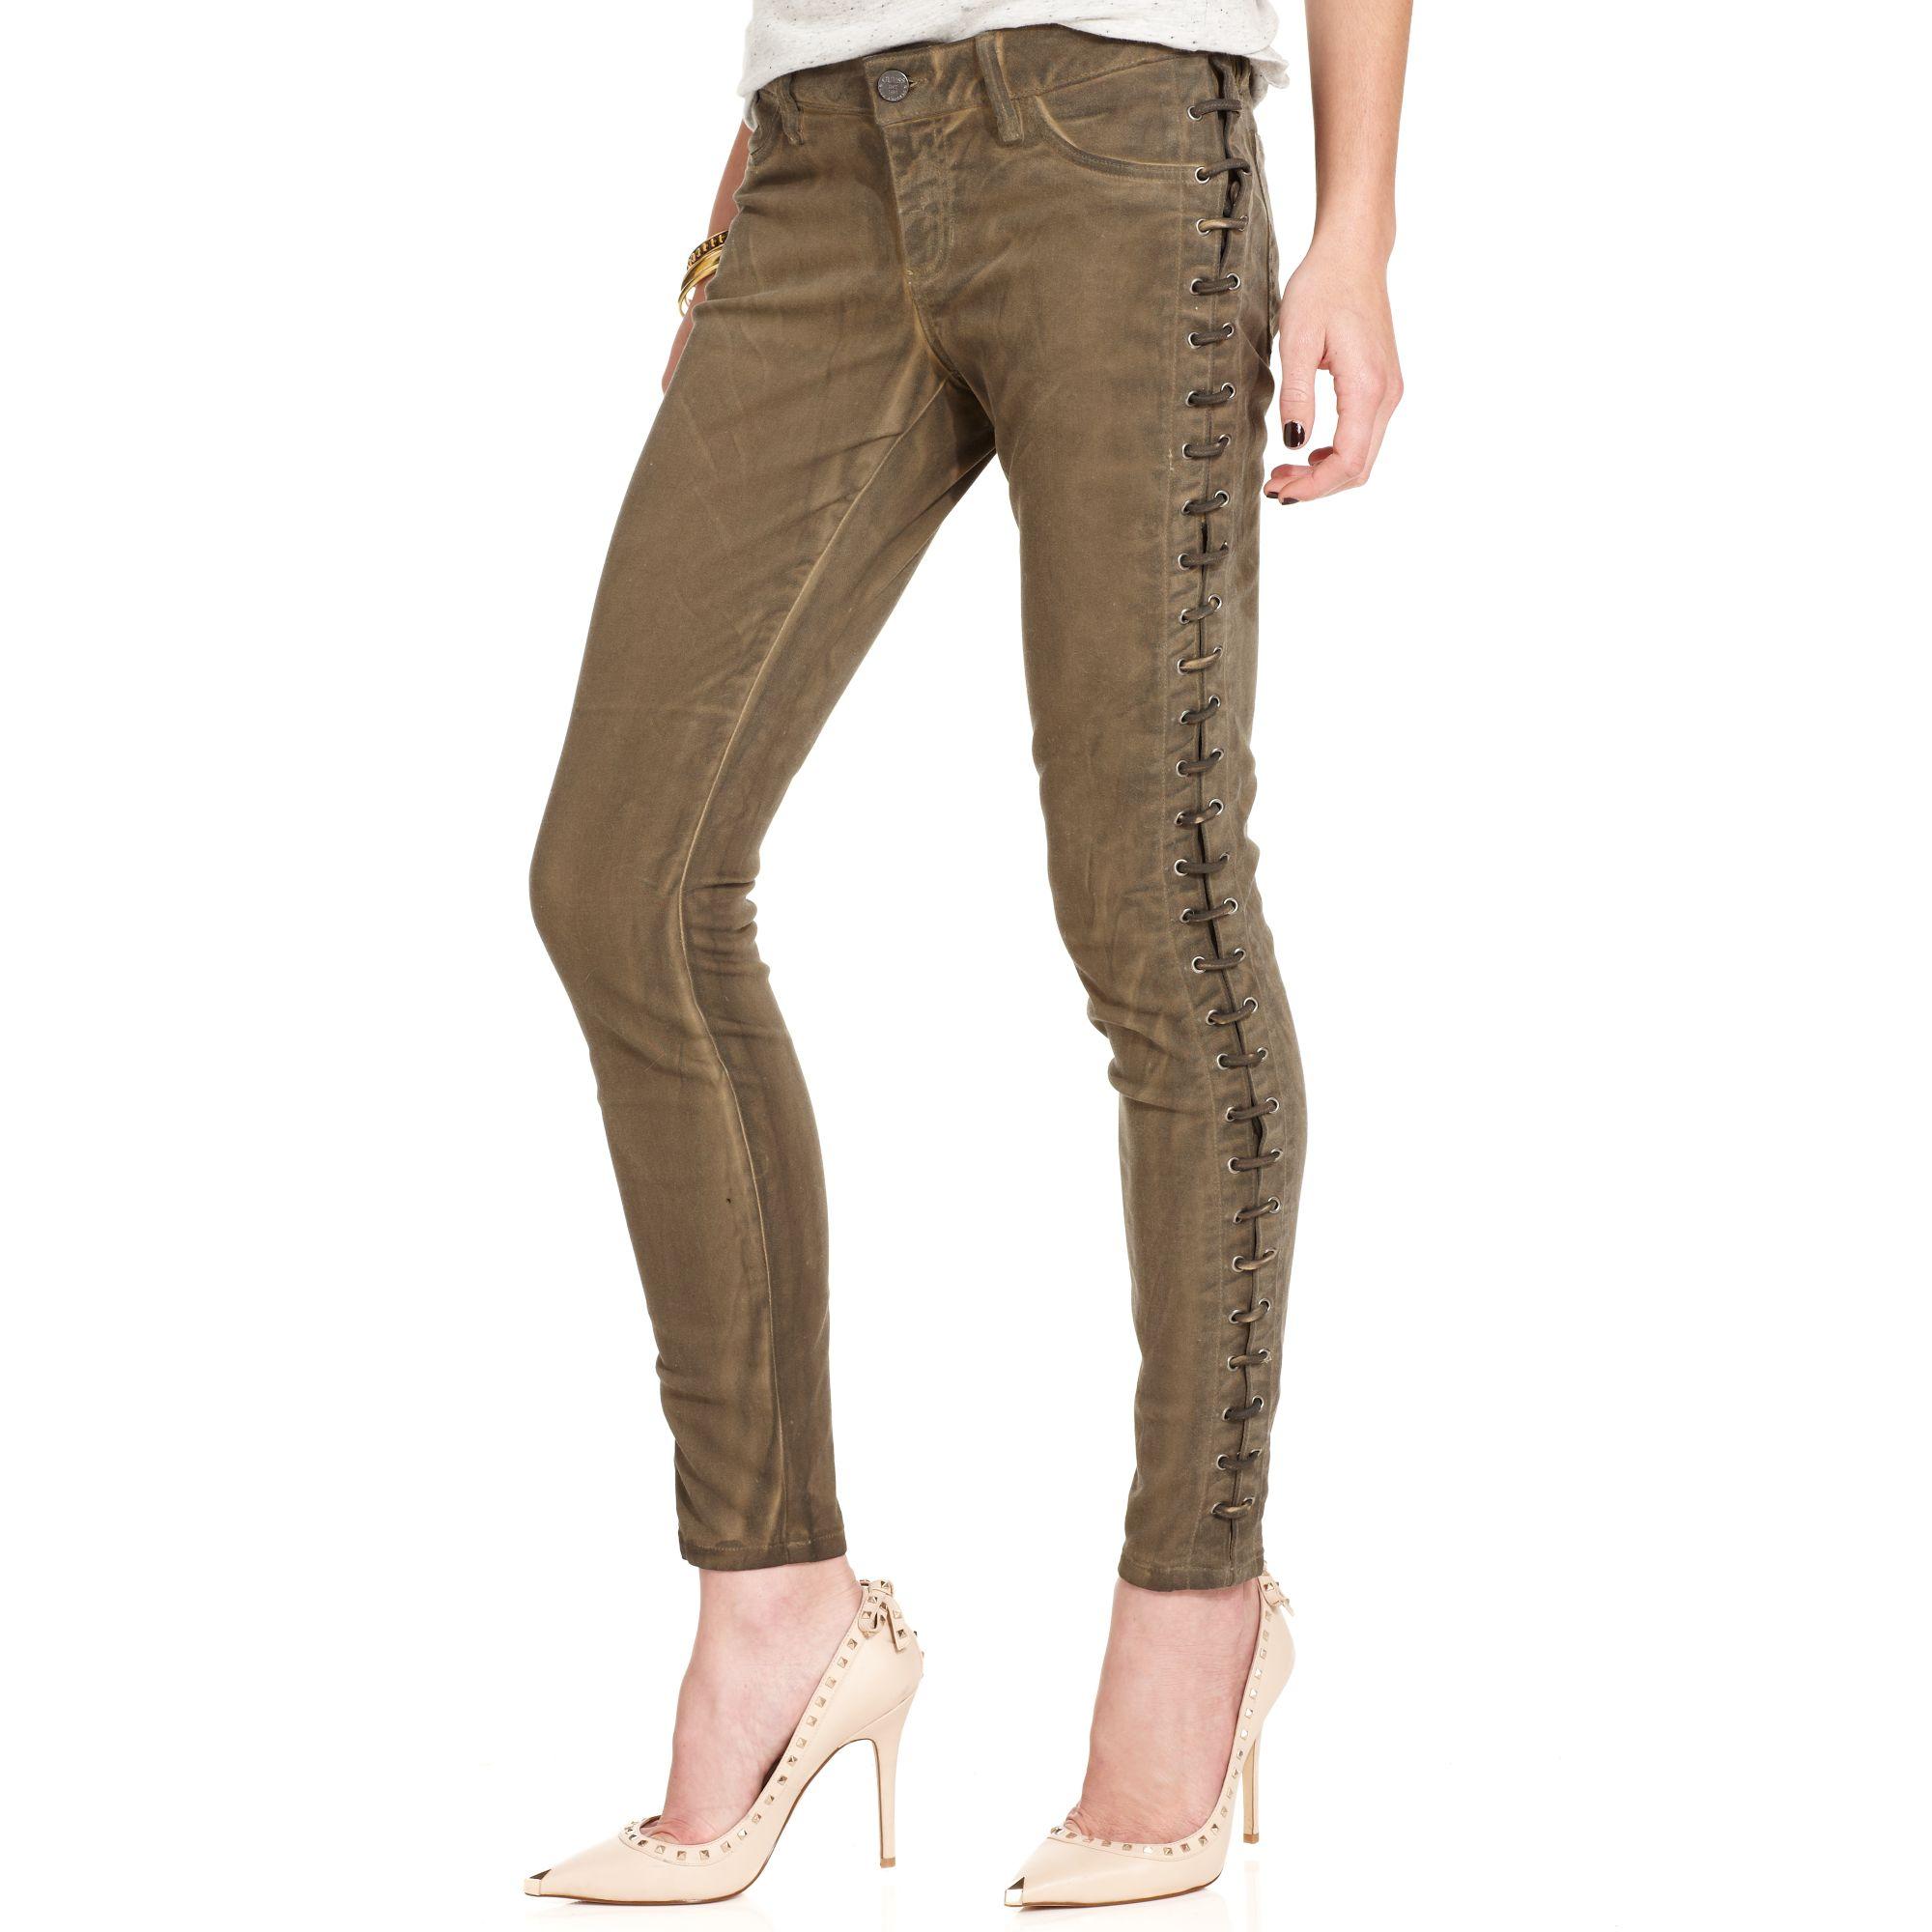 Carhartt Jeans For Women